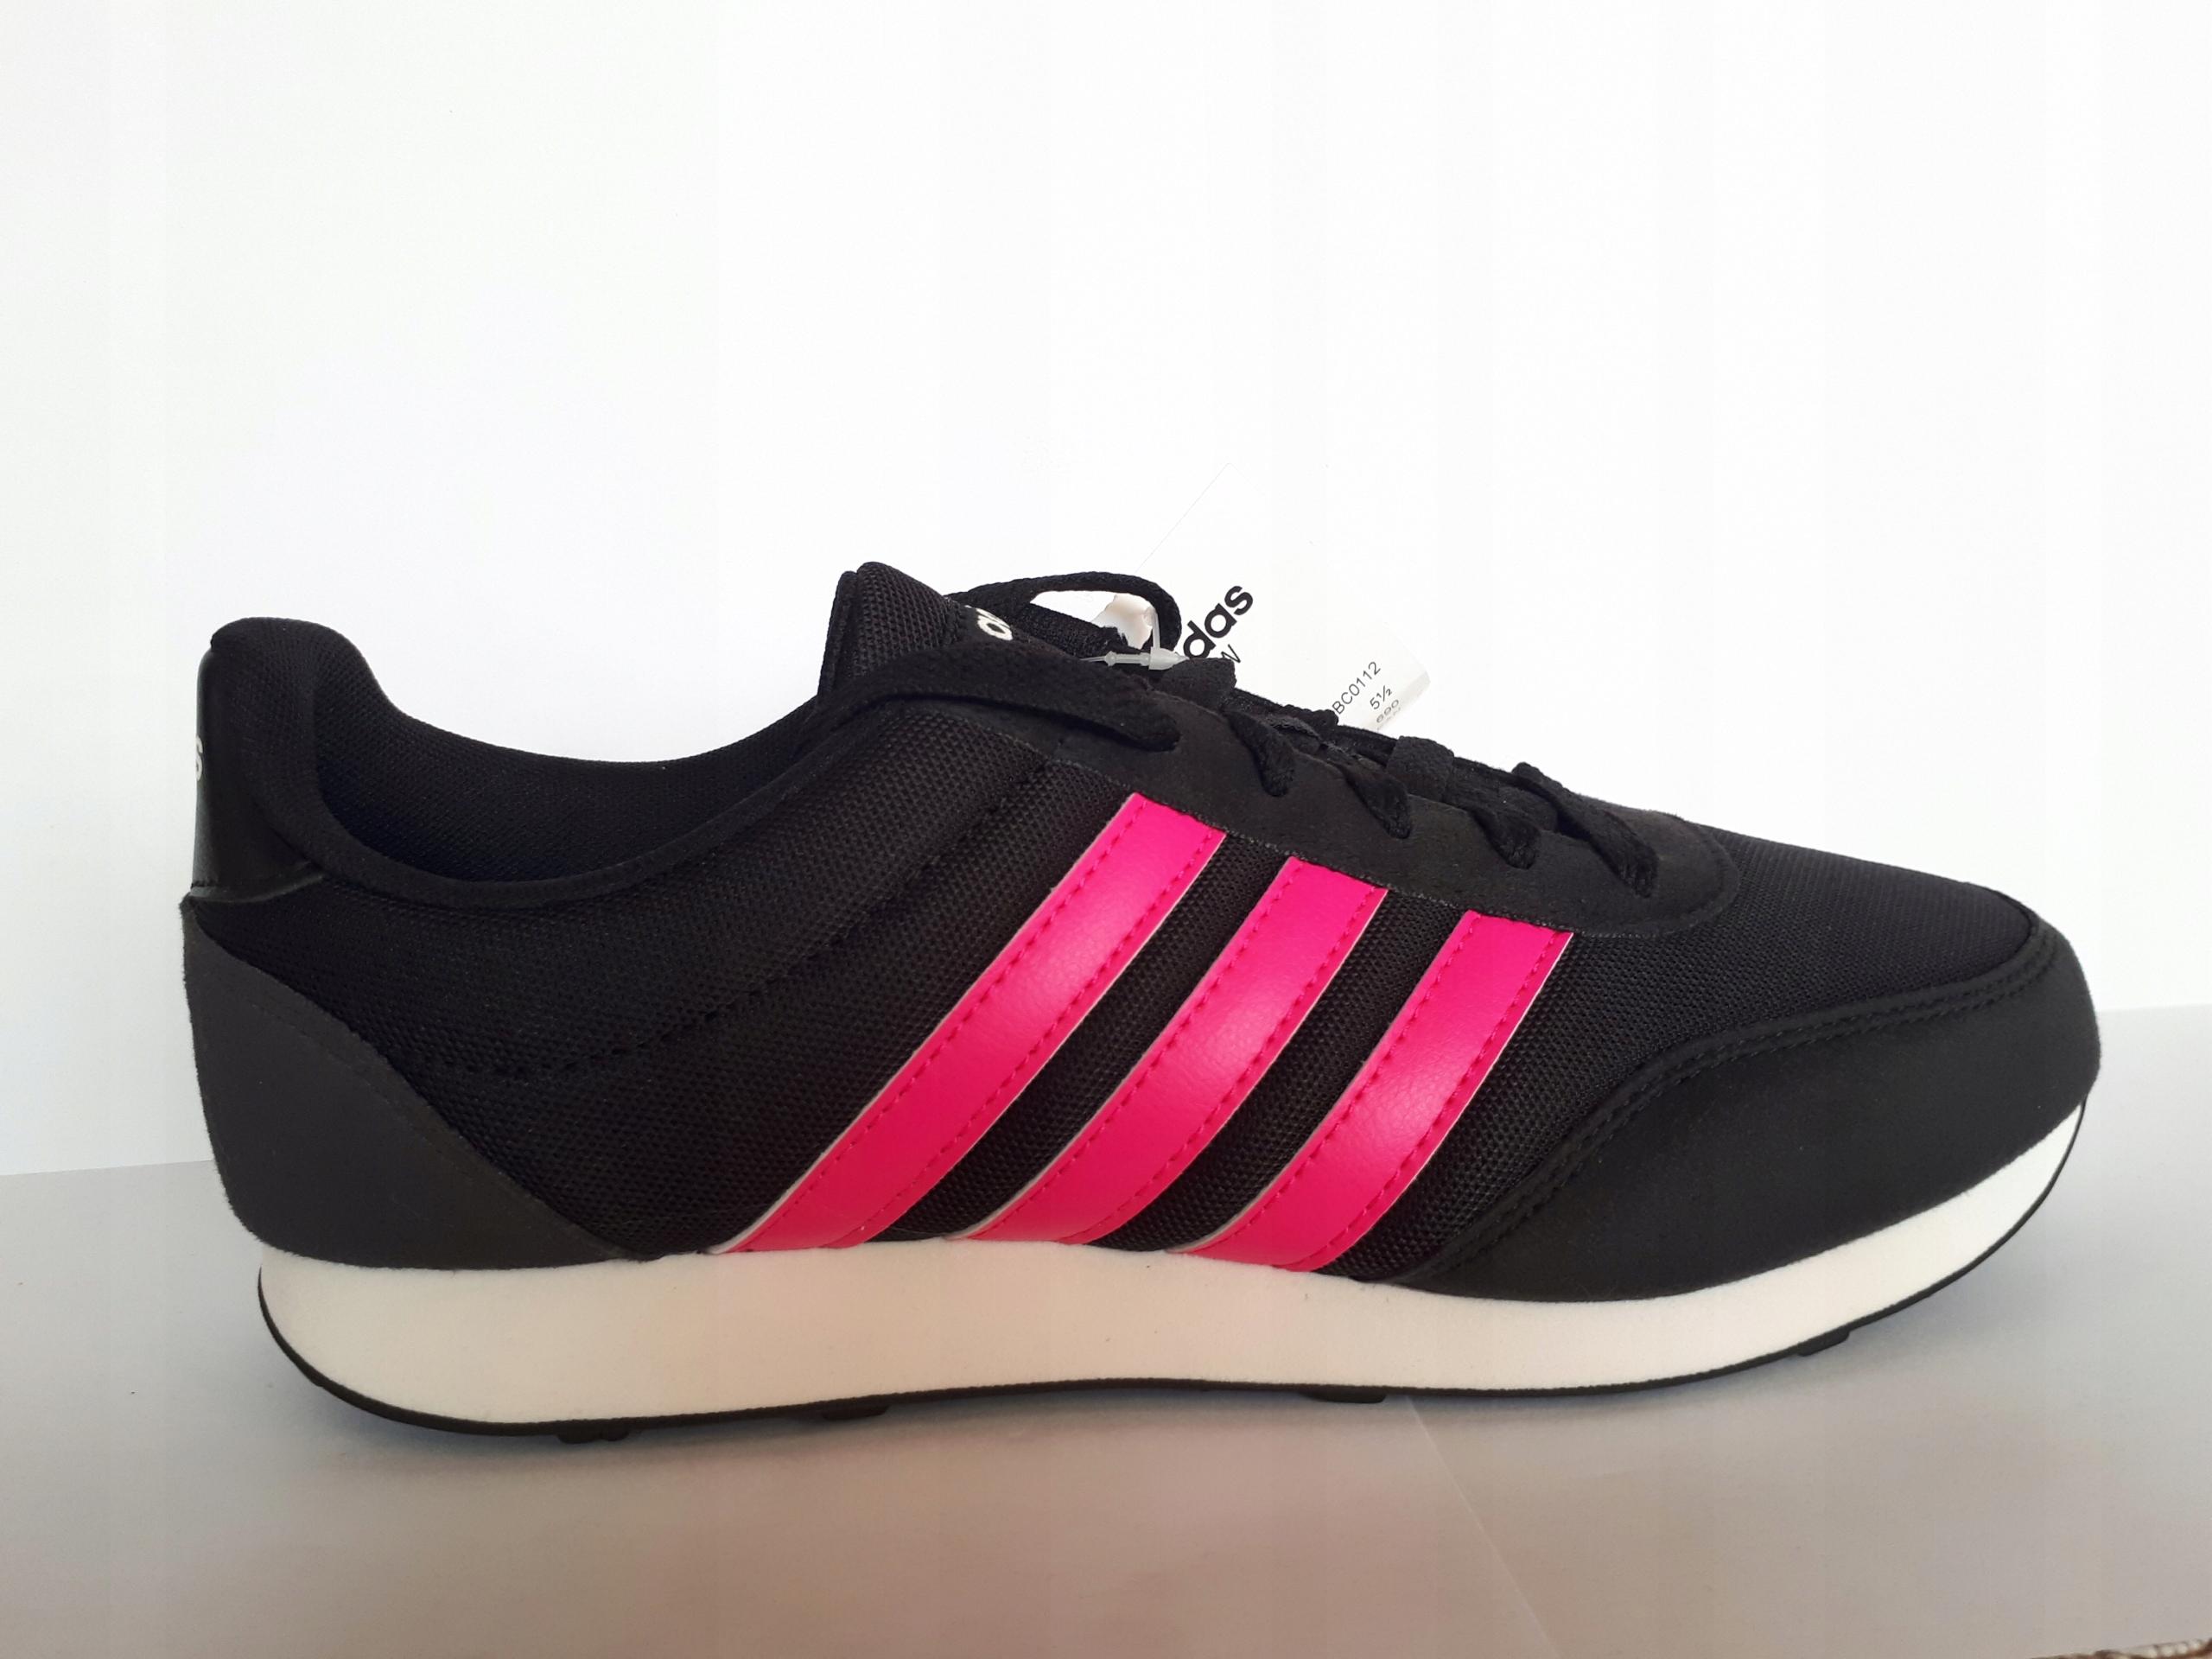 separation shoes 2ac5a fa9e5 BUTY adidas V RACER 2.0 W BC0112 r.38 23